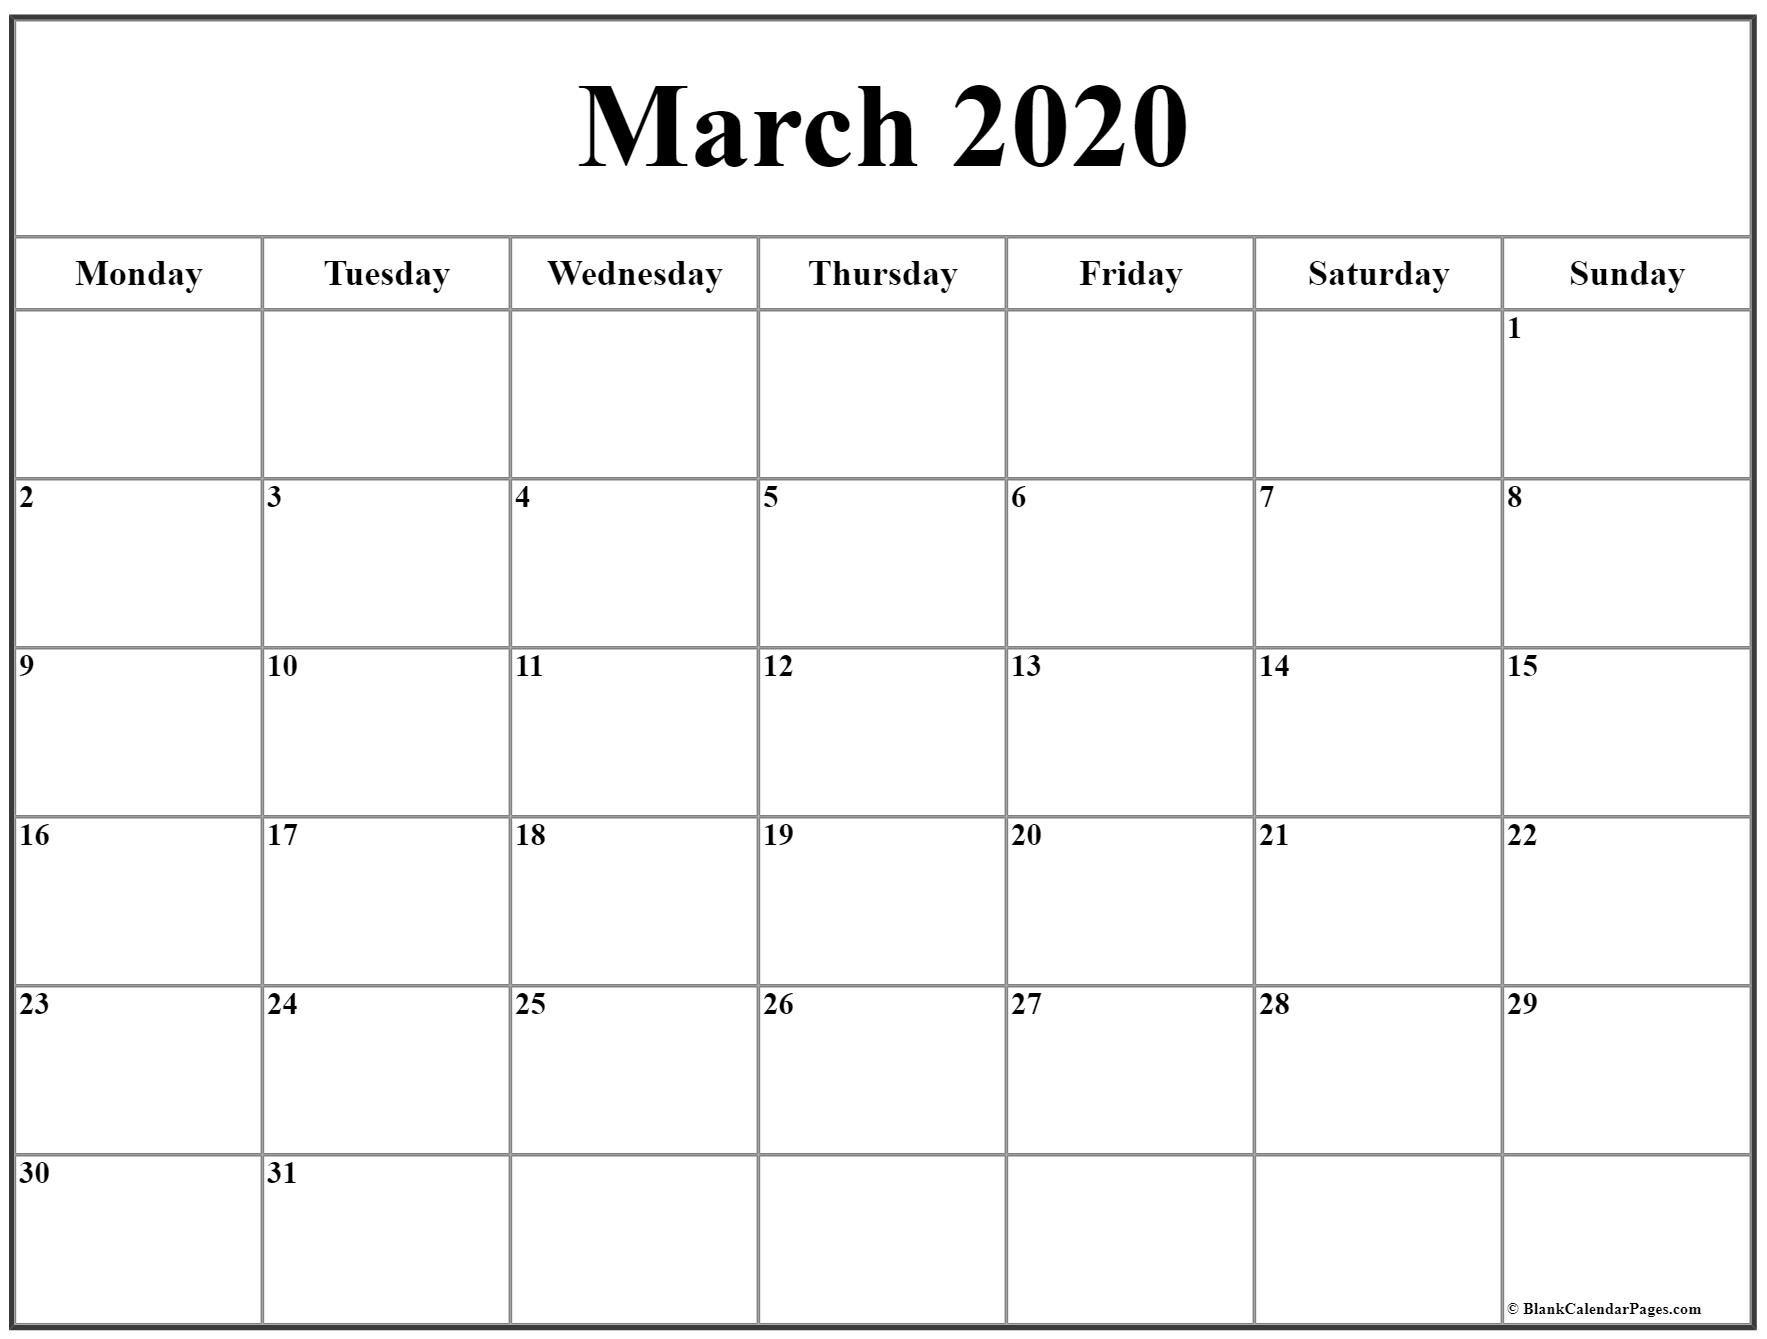 March 2020 Monday Calendar | Monday To Sunday Calendar Monday To Friday